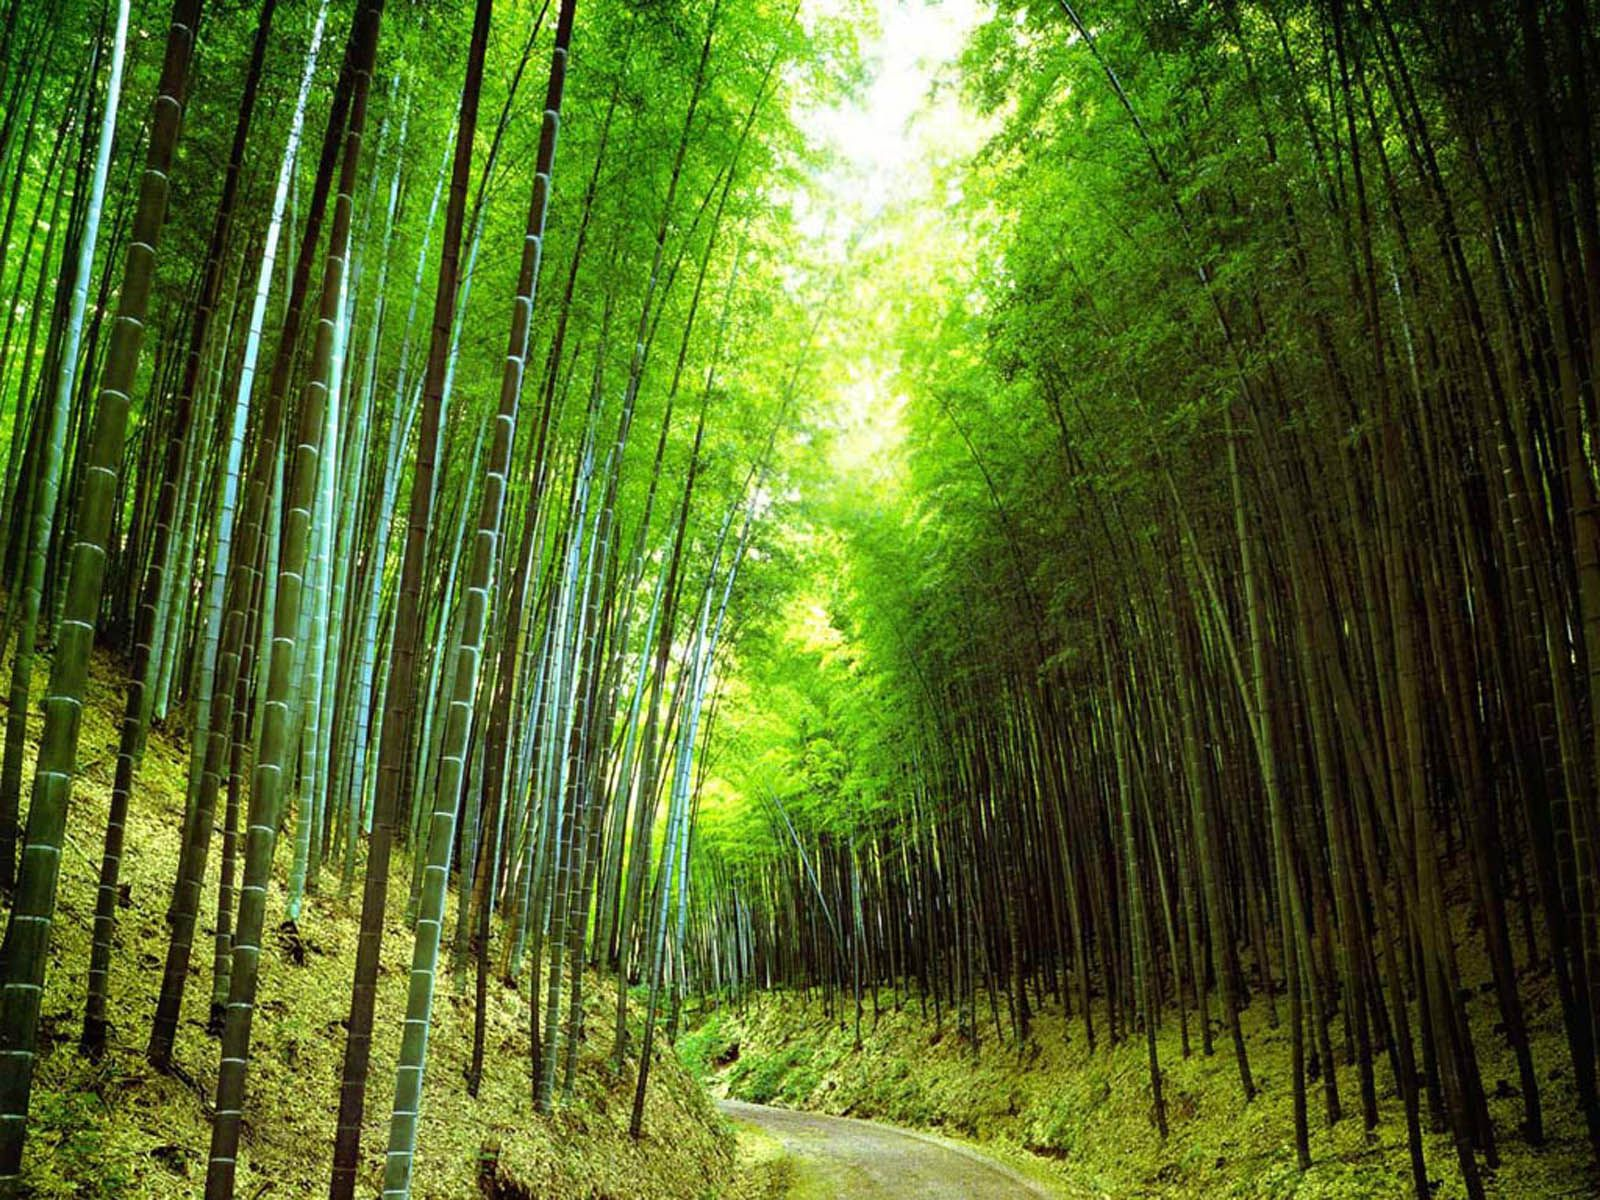 Wallpapers Bamboo Forest Wallpapers Bamboo Forest Forest Wallpaper Tree Forest